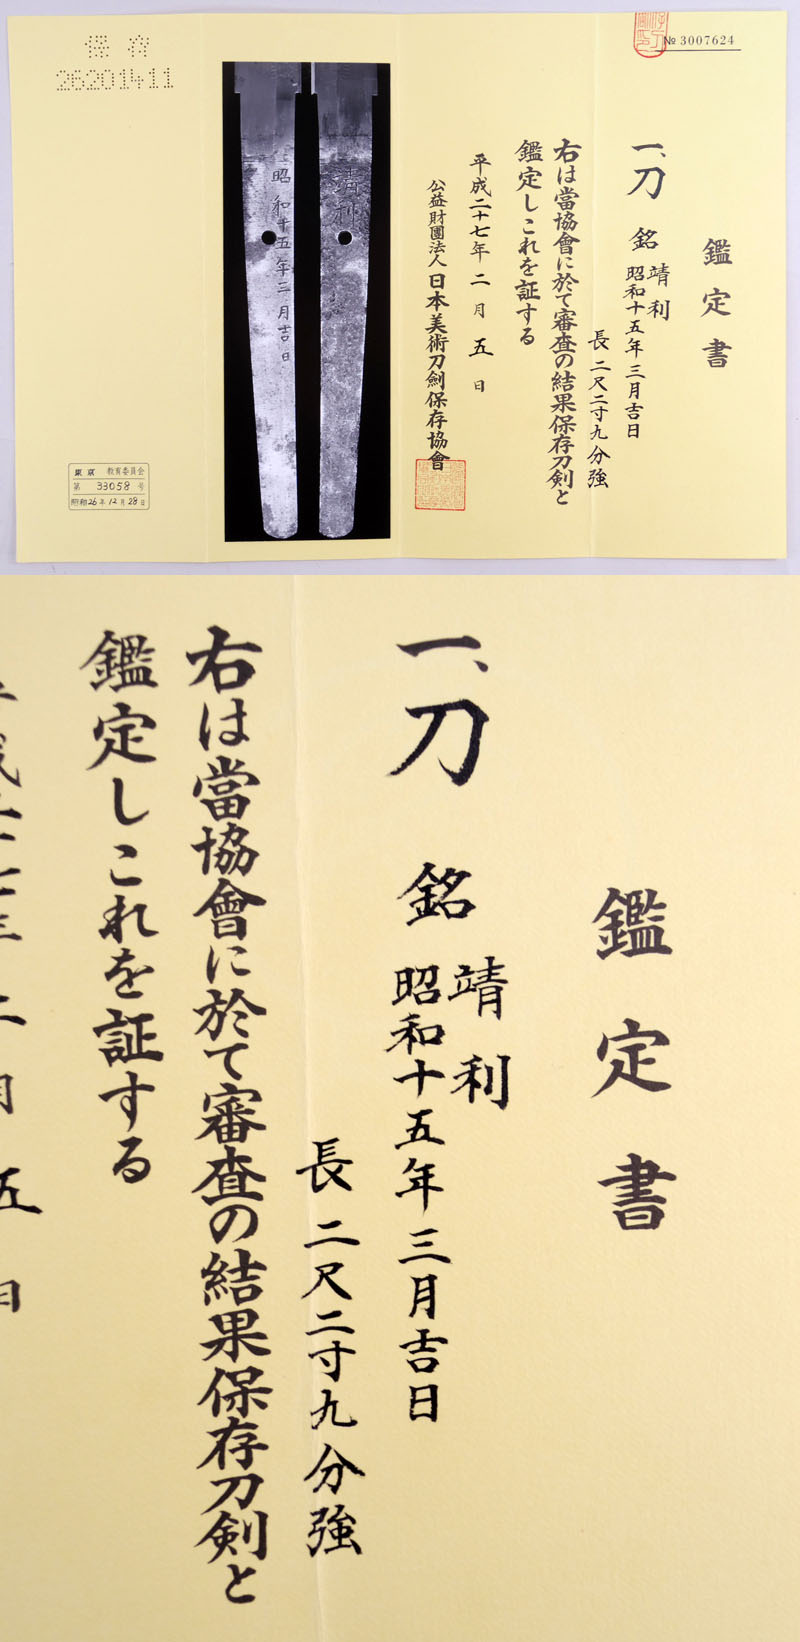 靖利(梶山靖利) Picture of Certificate